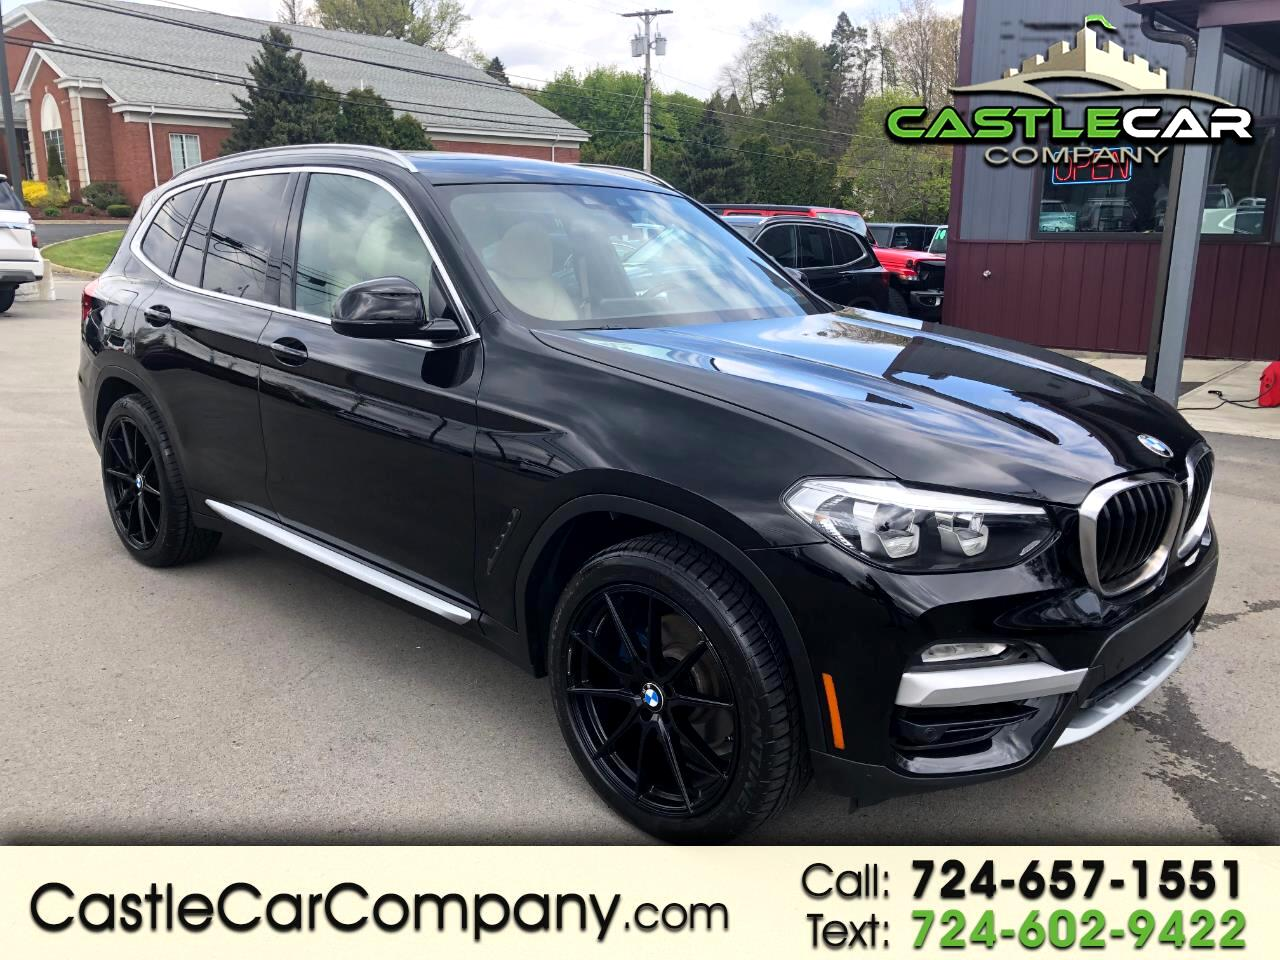 BMW X3 xDrive30i Sports Activity Vehicle 2019